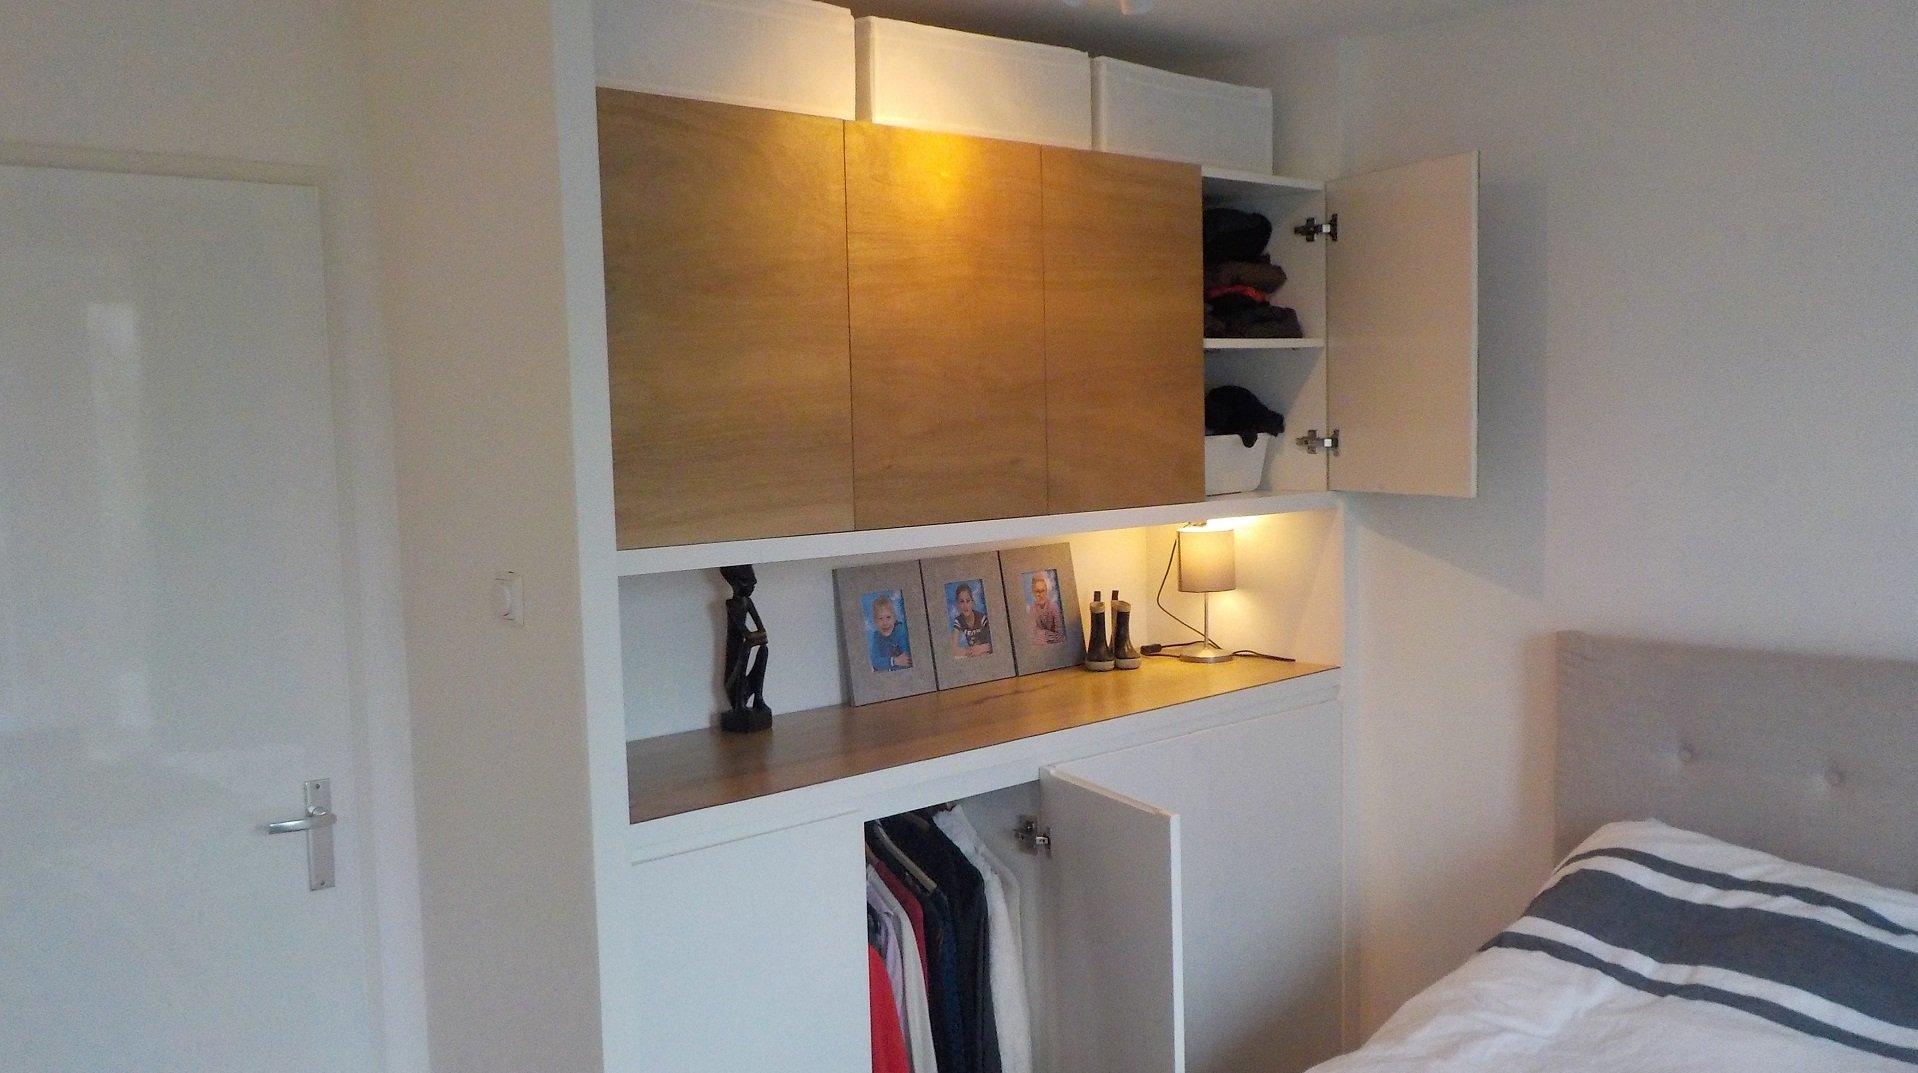 Design afbeeldingen muren - Kledingkast en dressoir ...